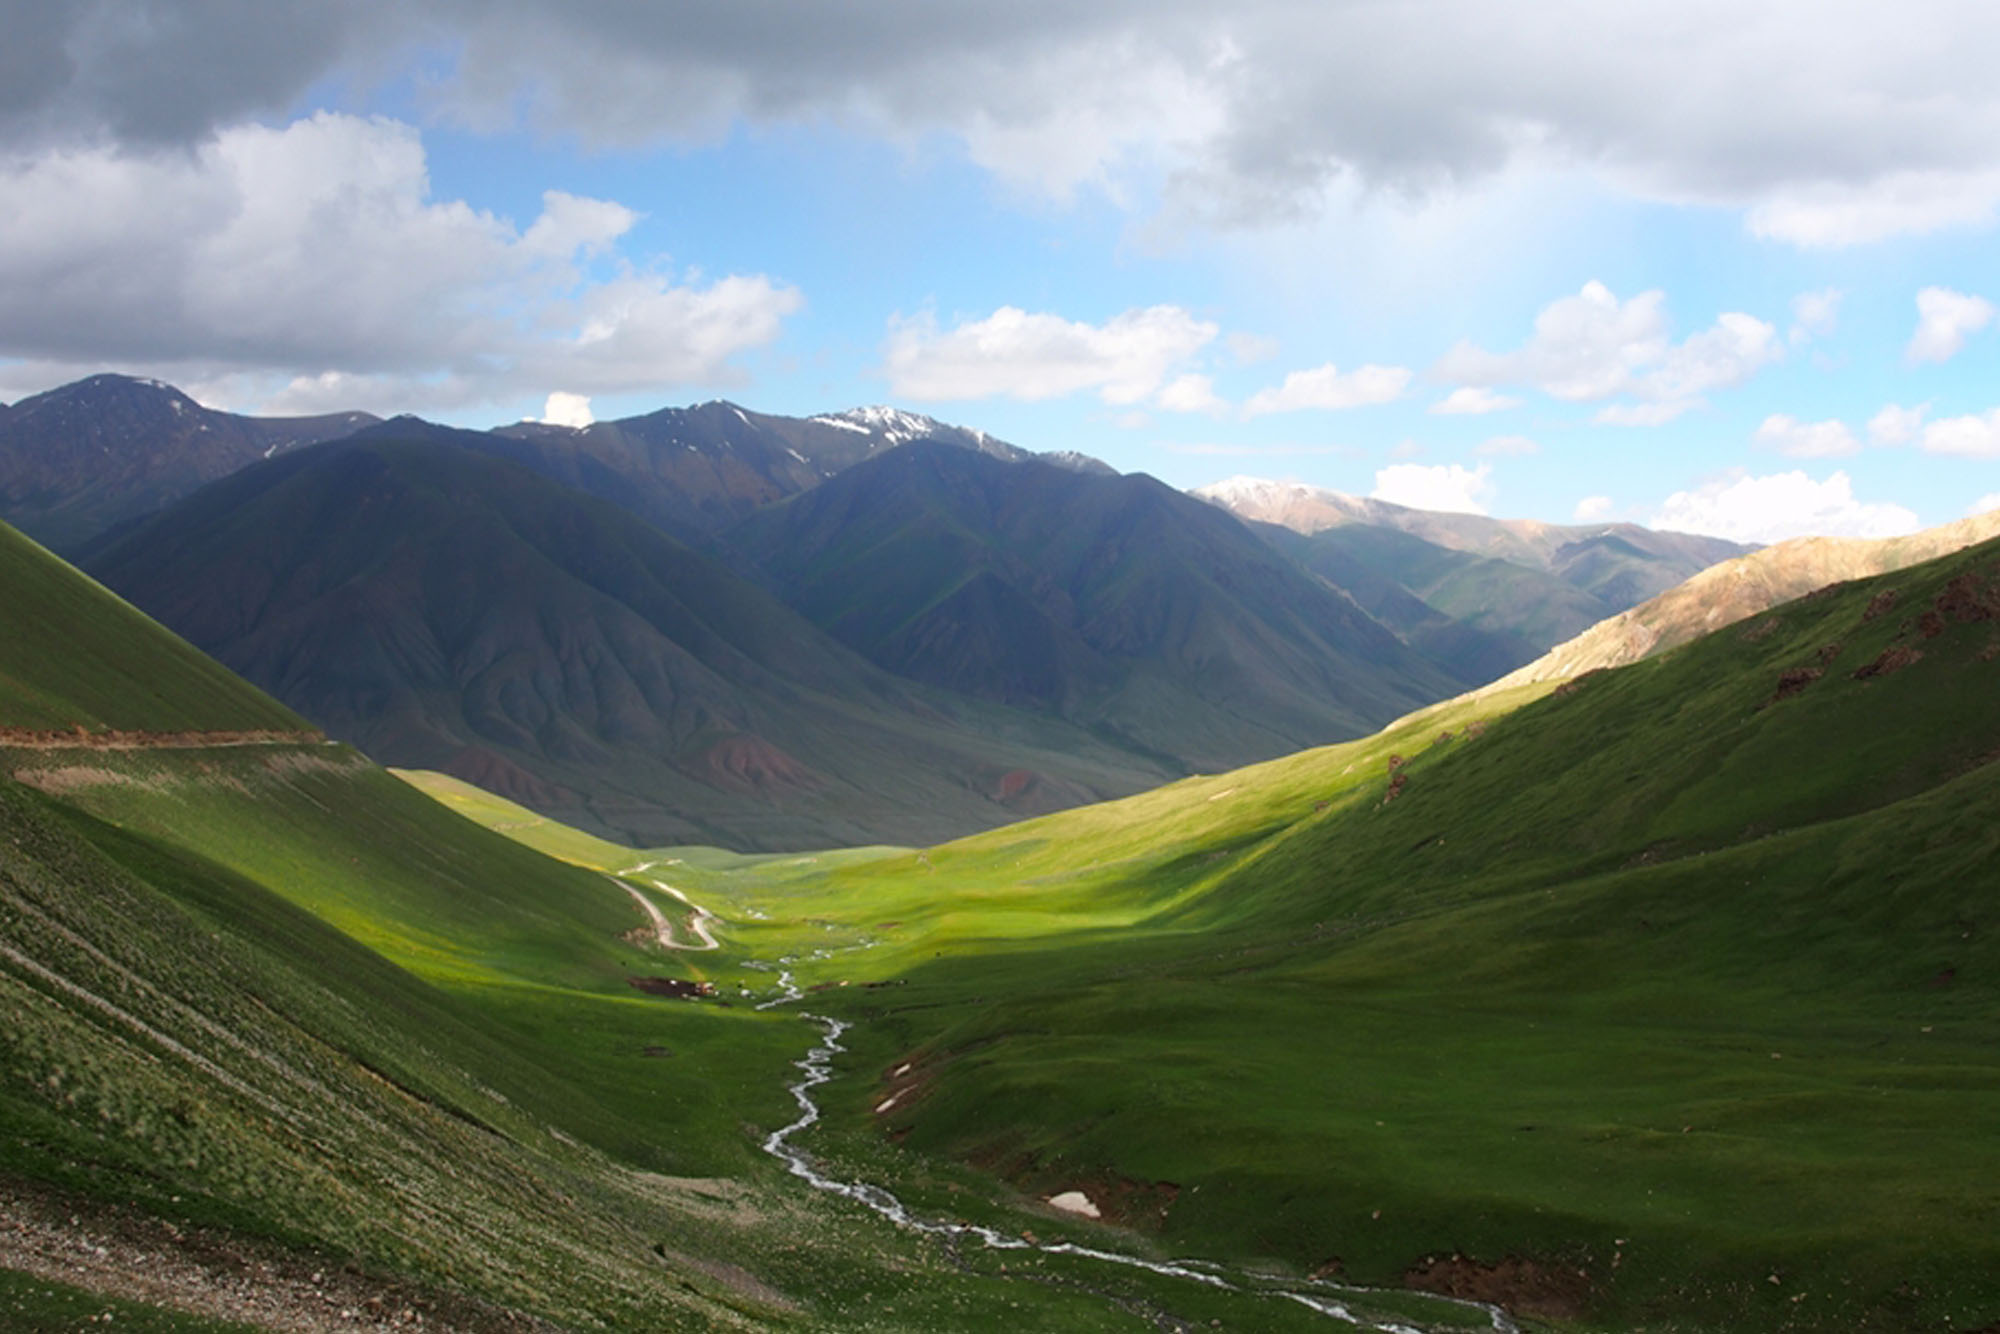 W drodze nad Song-kul – Kirgistan